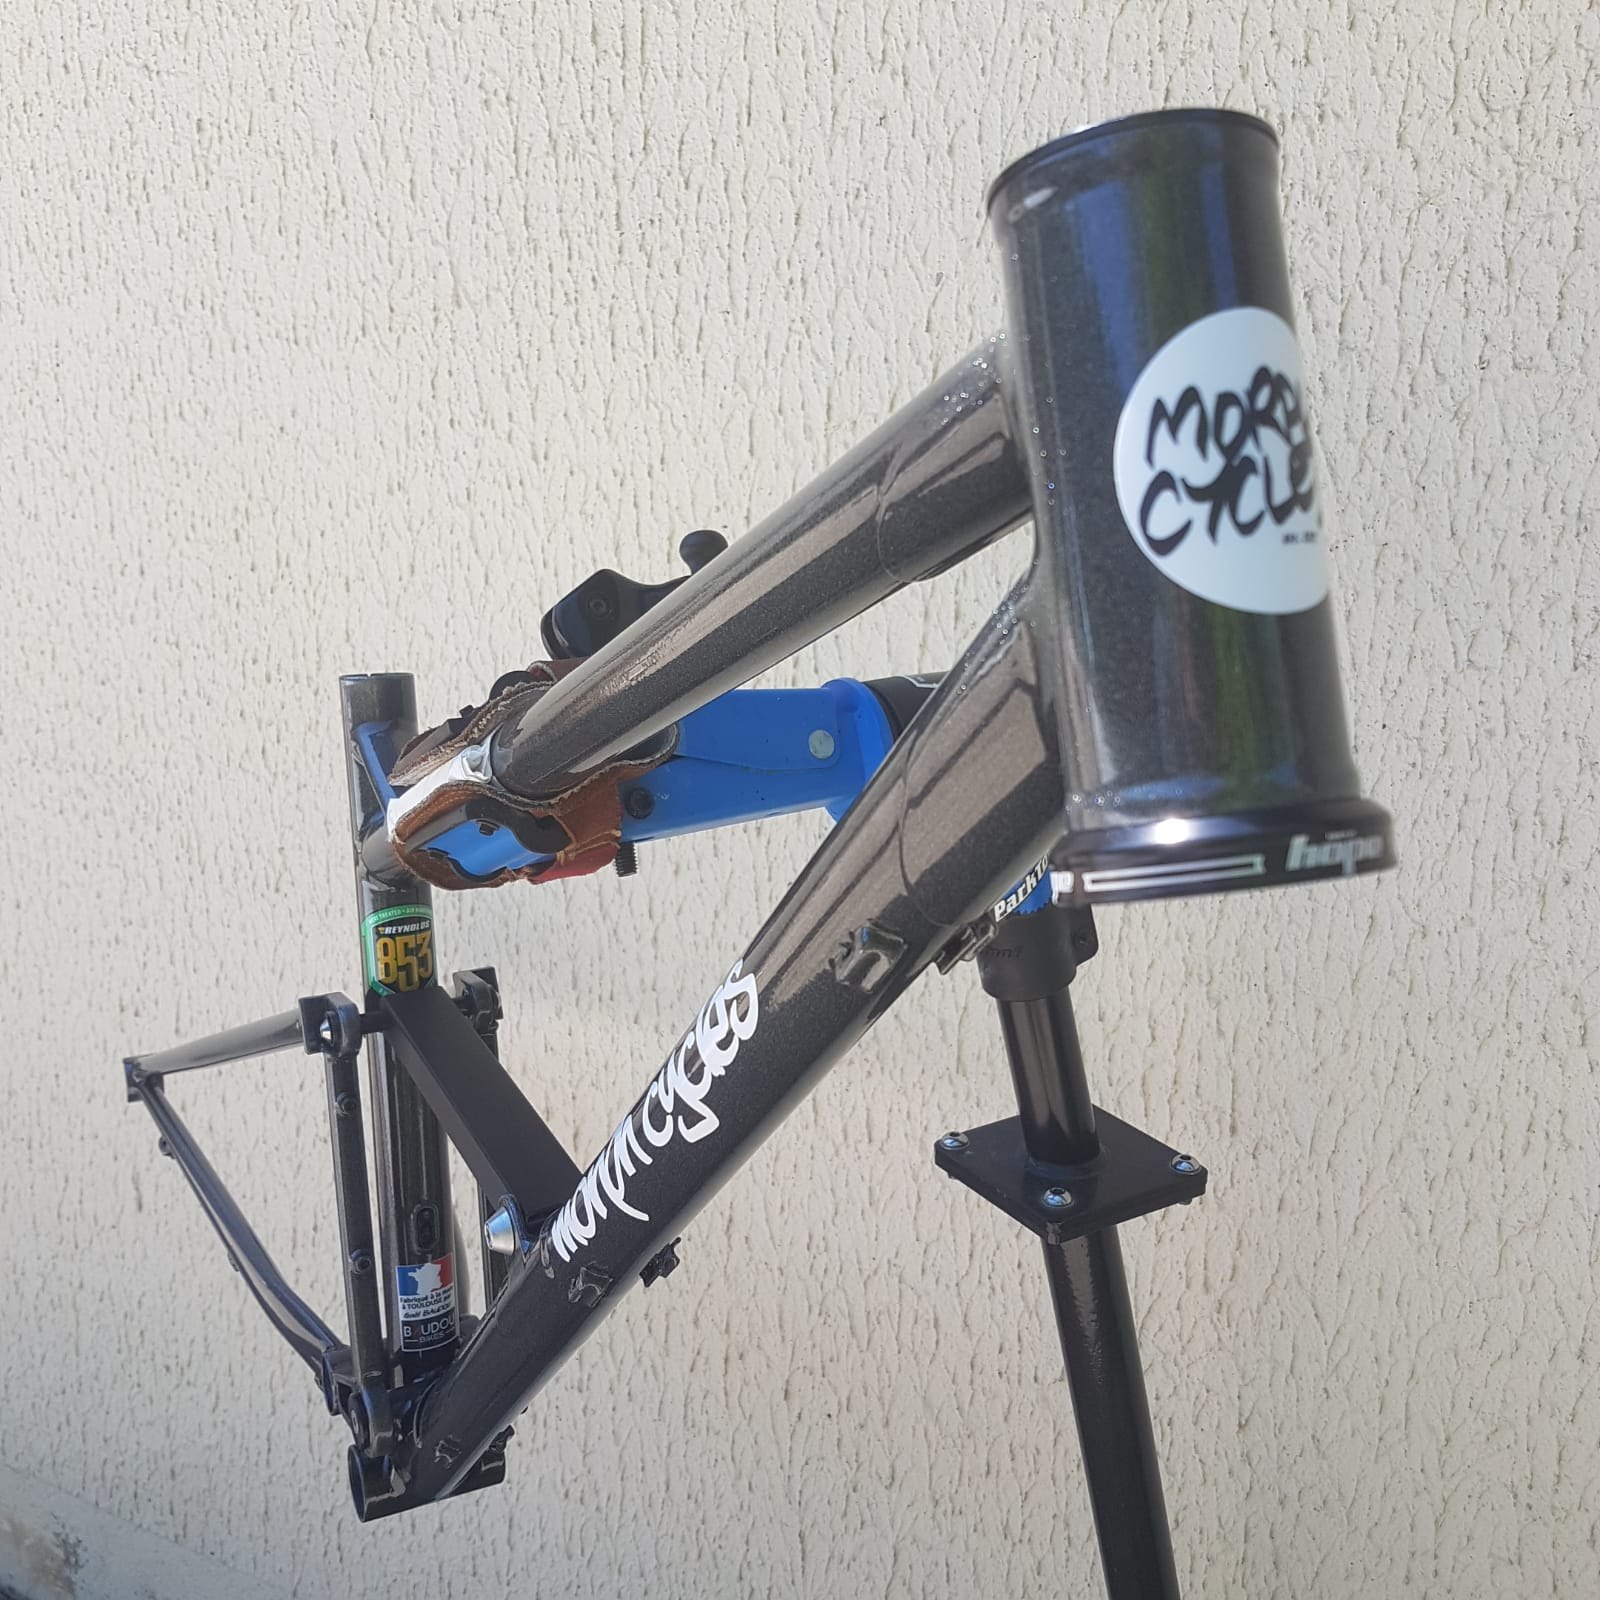 Baudou_bikes_tout_suspendu_douille_fini